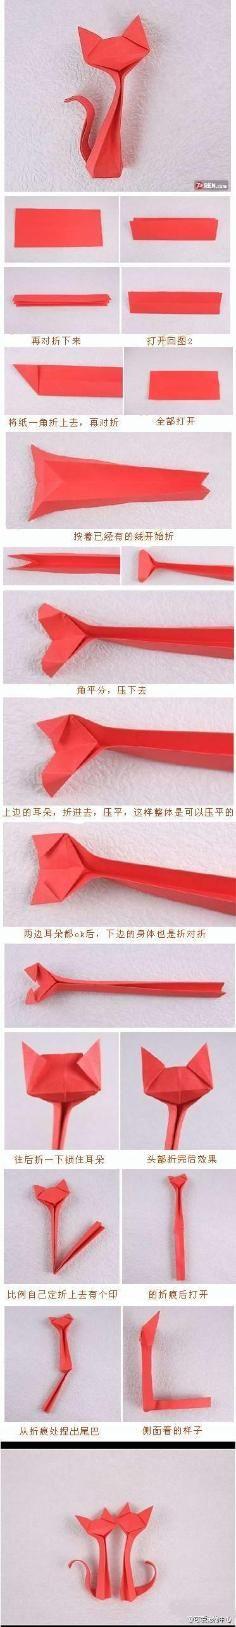 DIY Origami - Bead&Cord